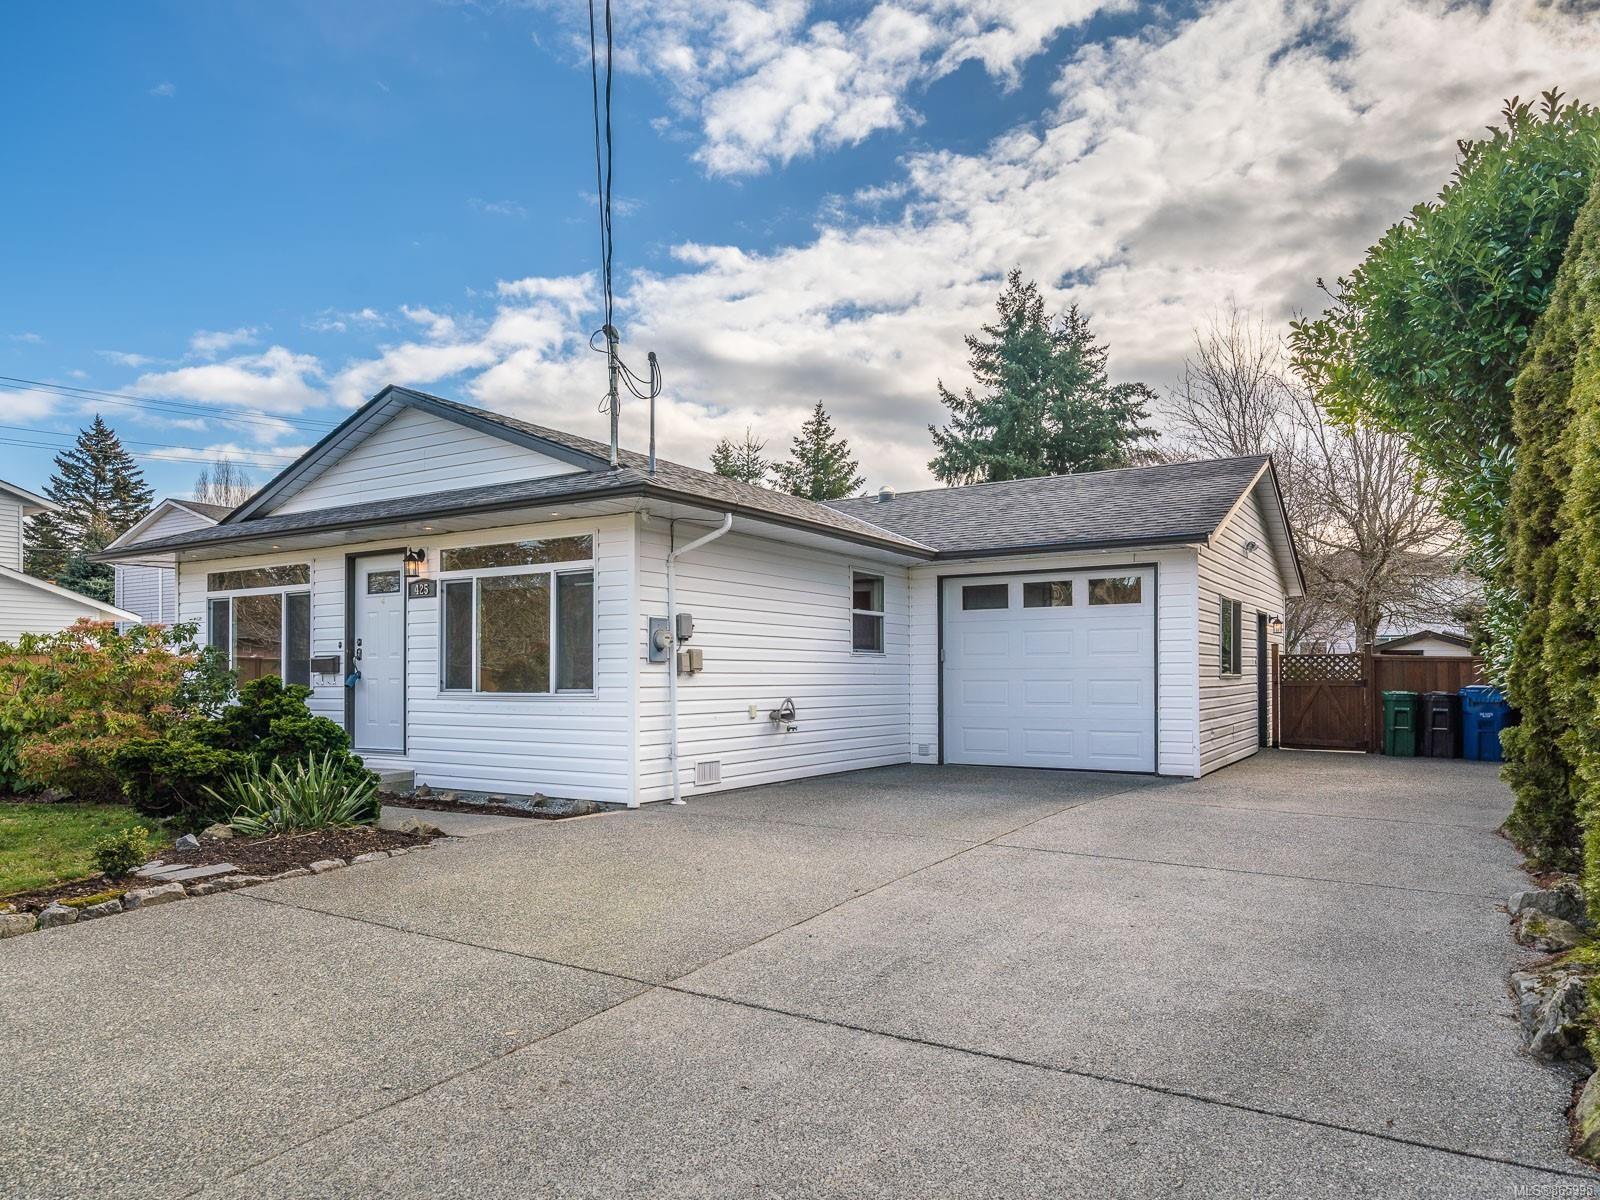 Main Photo: 425 Deering St in : Na South Nanaimo House for sale (Nanaimo)  : MLS®# 865995